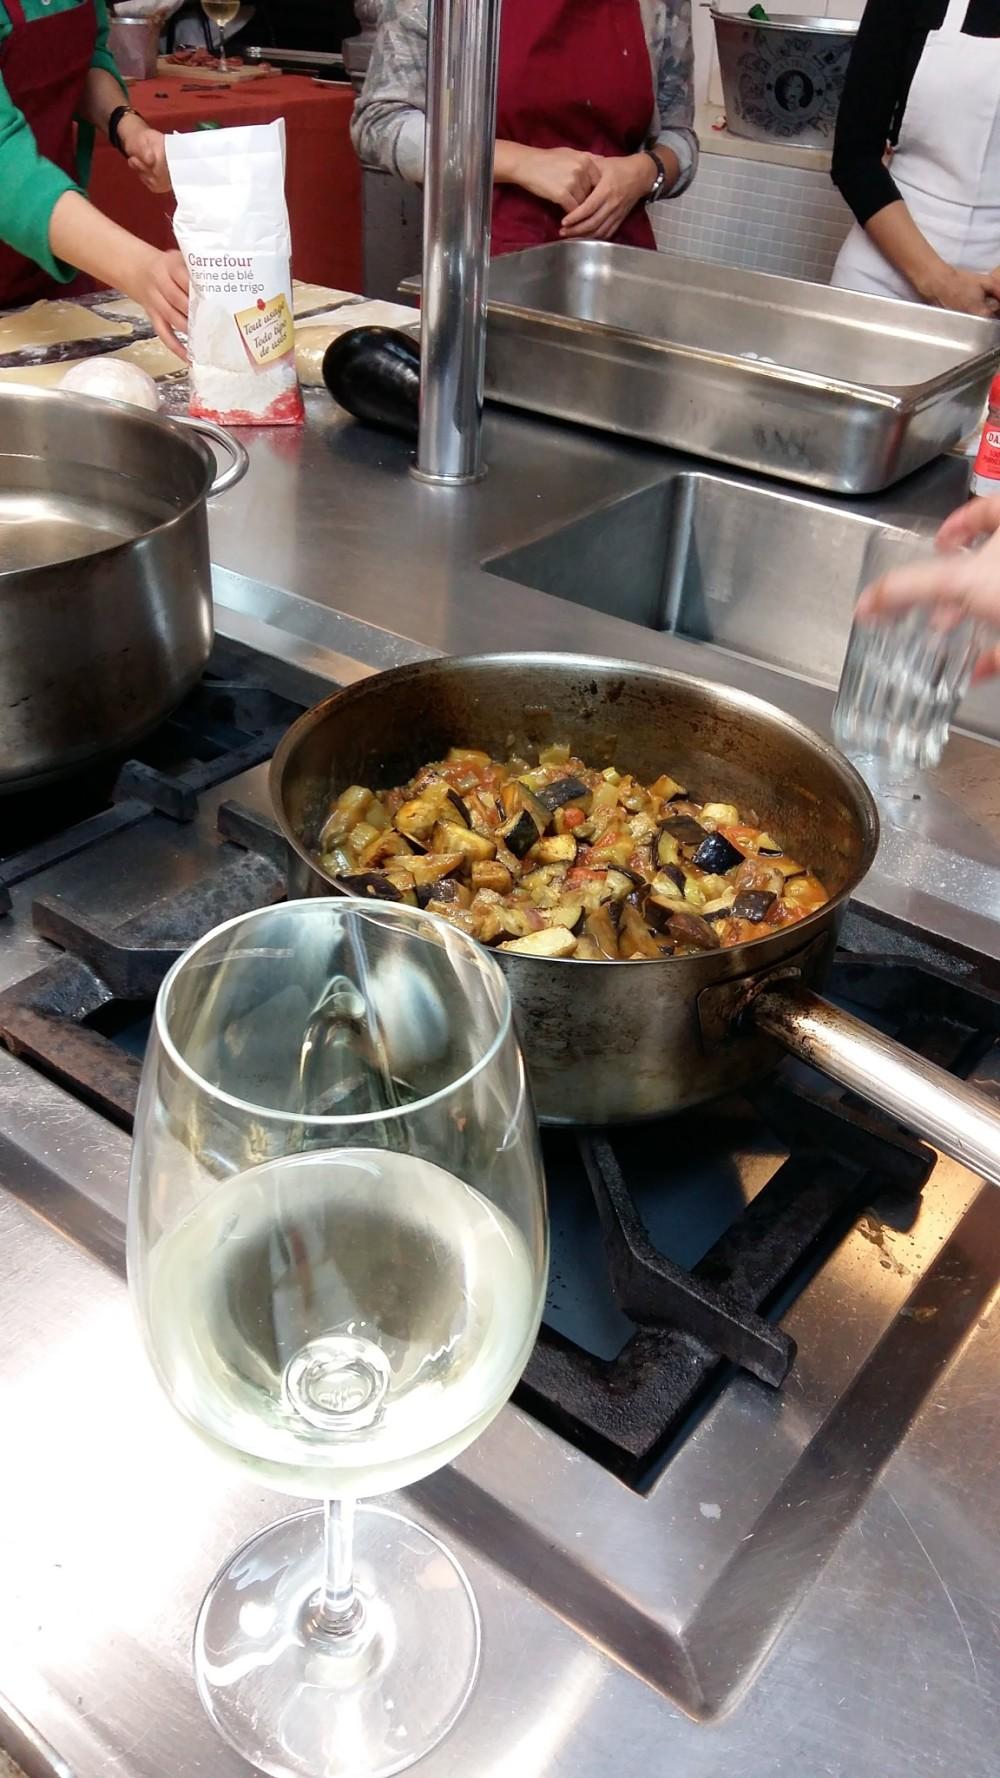 utf-8qcumpleac3b1os_cocinando2ejpg